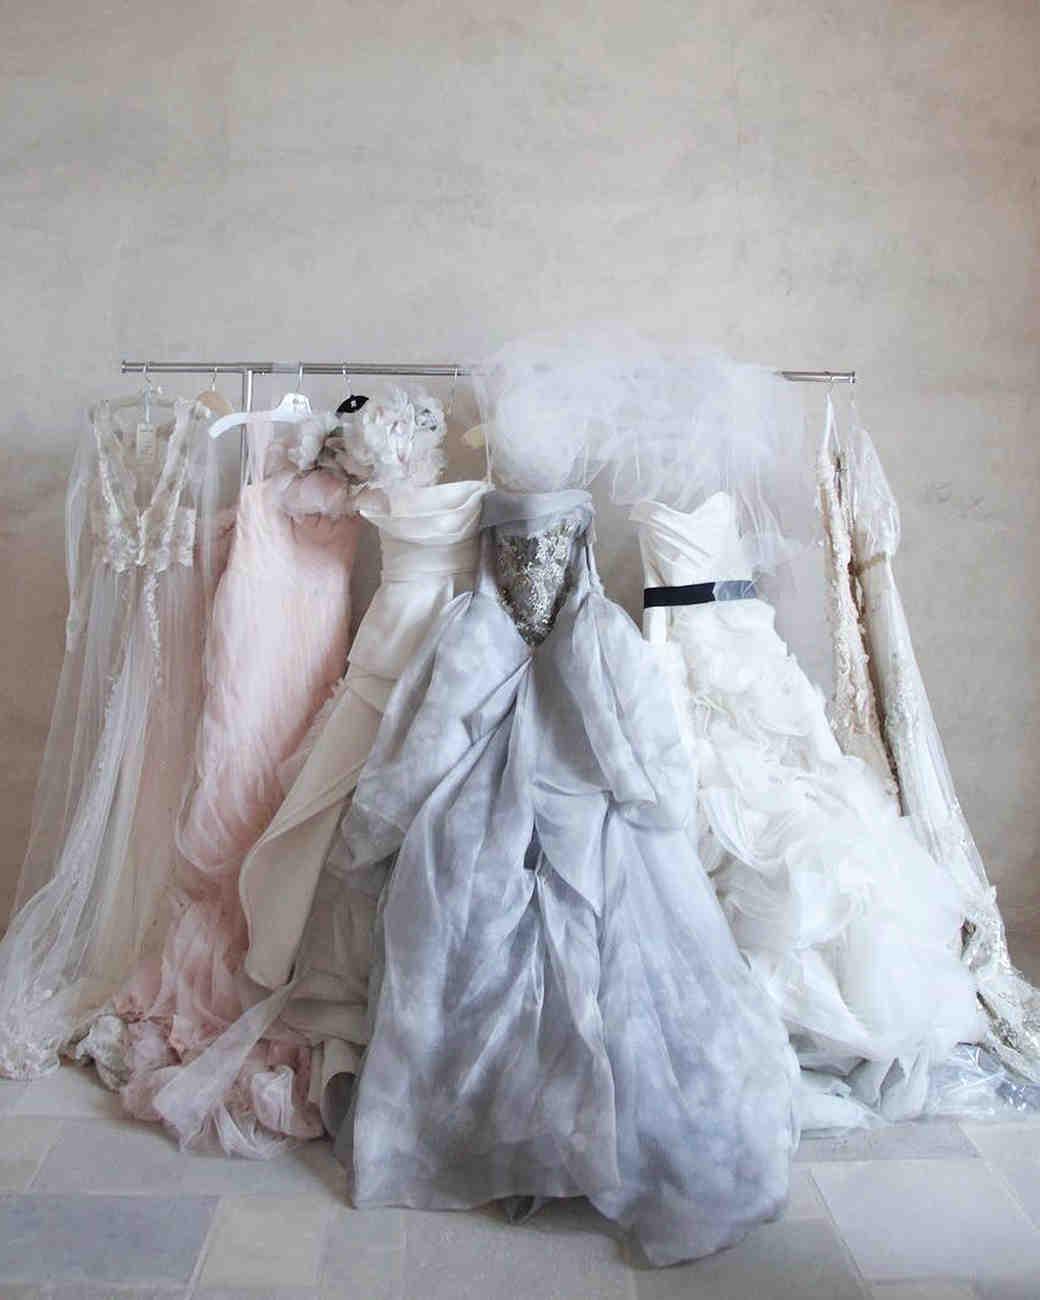 instagram-photos-elizabeth-messina-takeover-wedding-dresses-0716.jpg